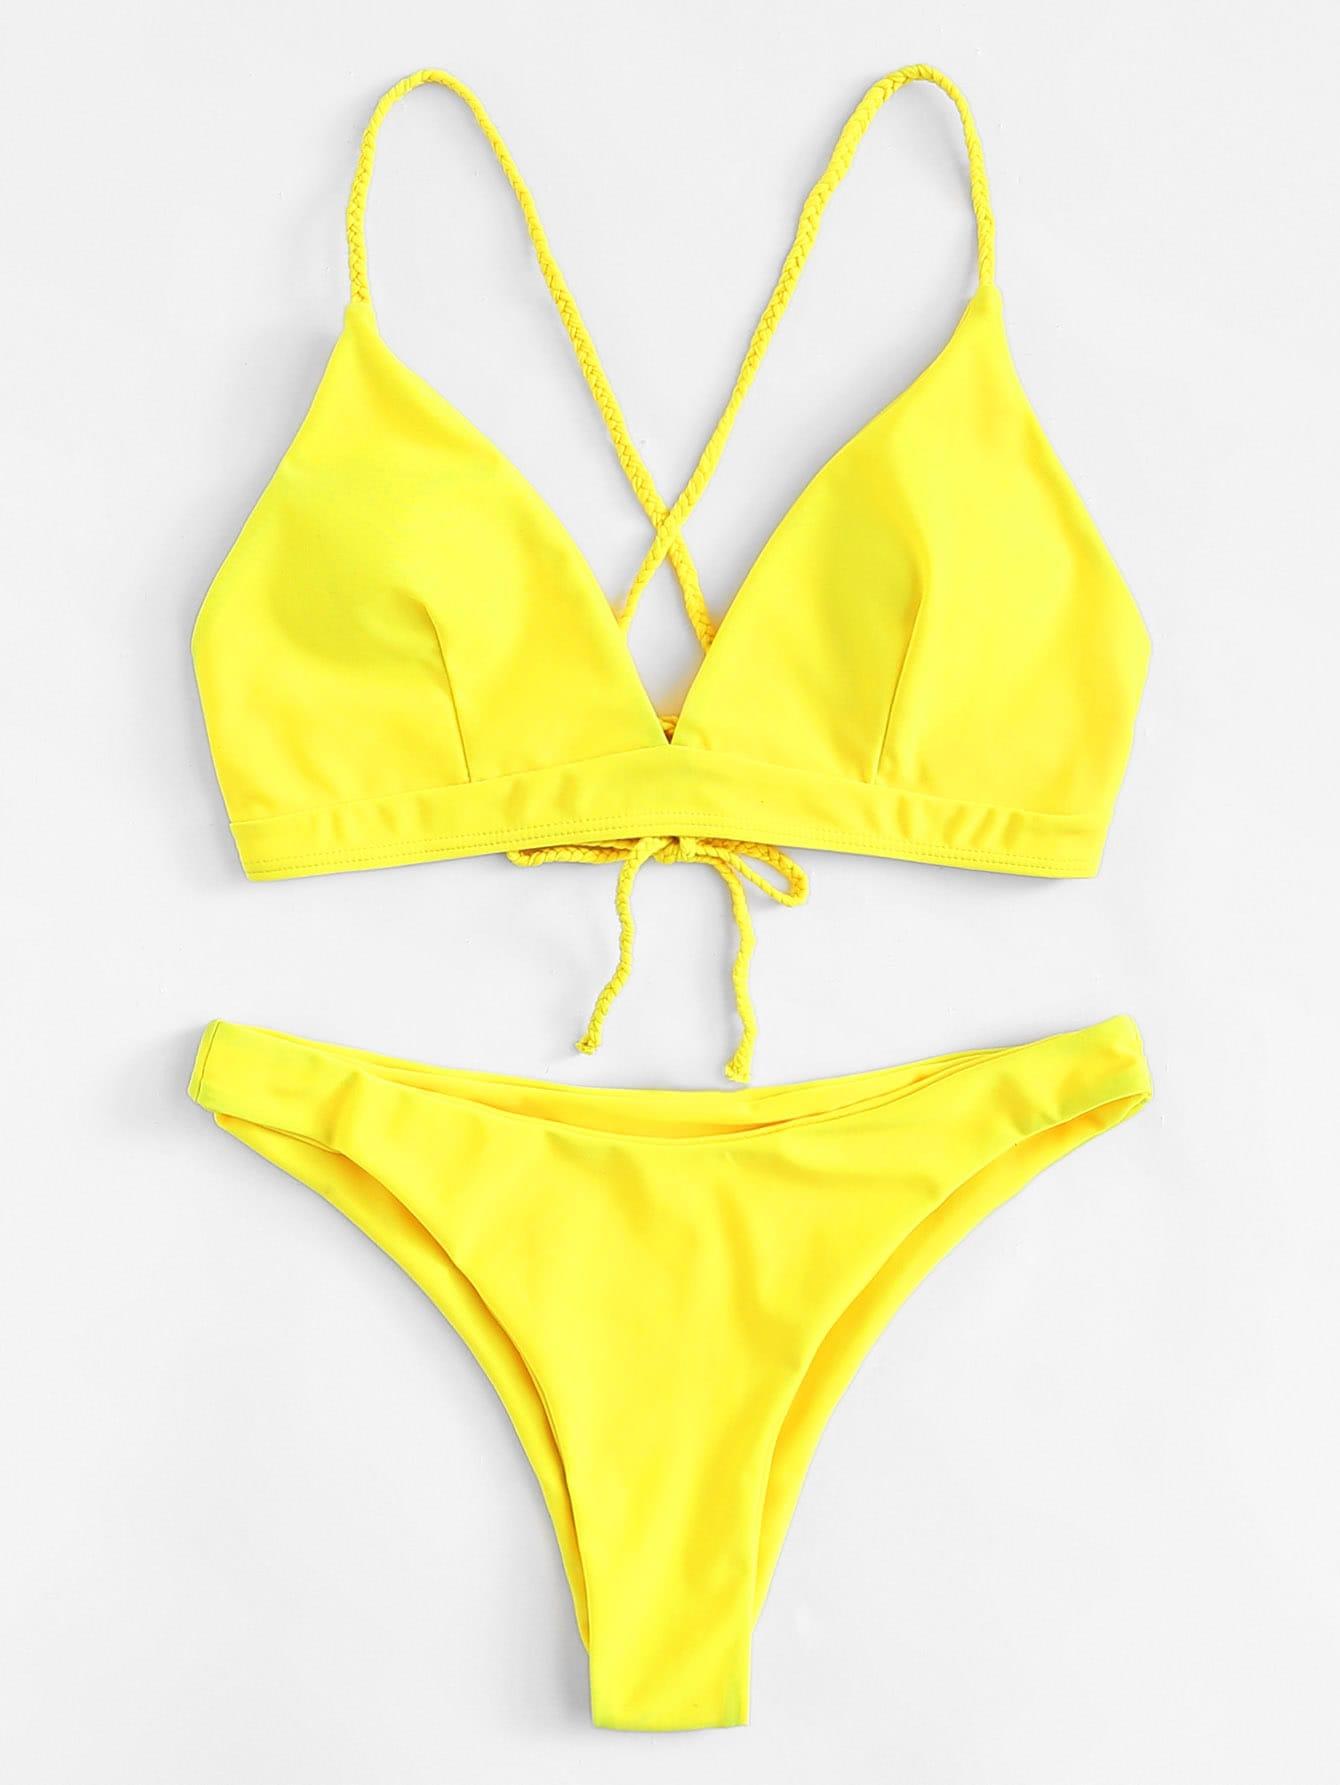 Braided Strap Lace Up Bikini Set все цены